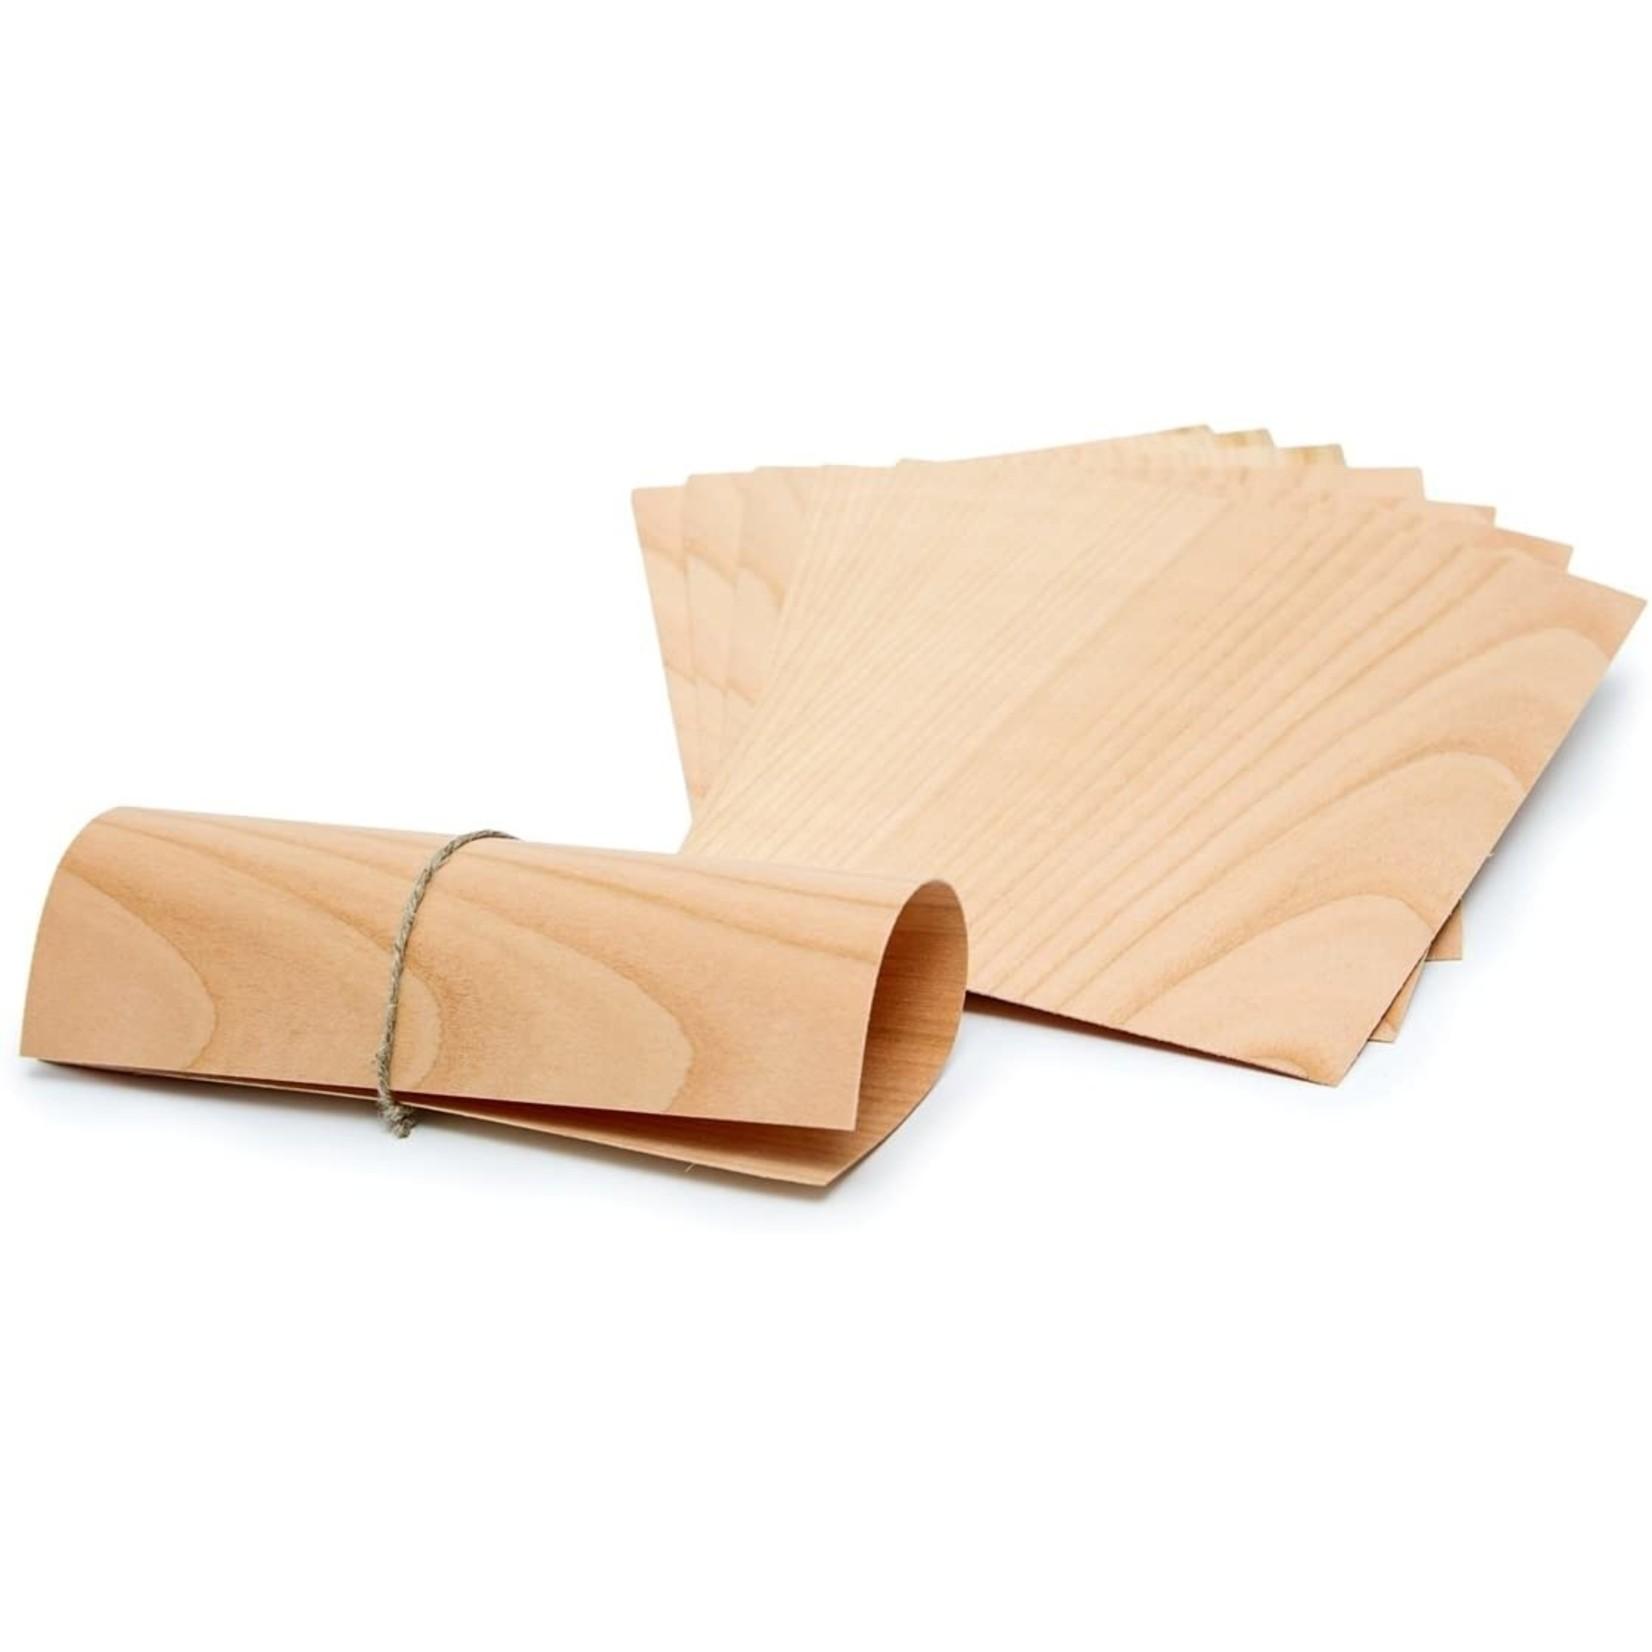 Axtschlag Axtschlag wood bbq papers Cherry Wood